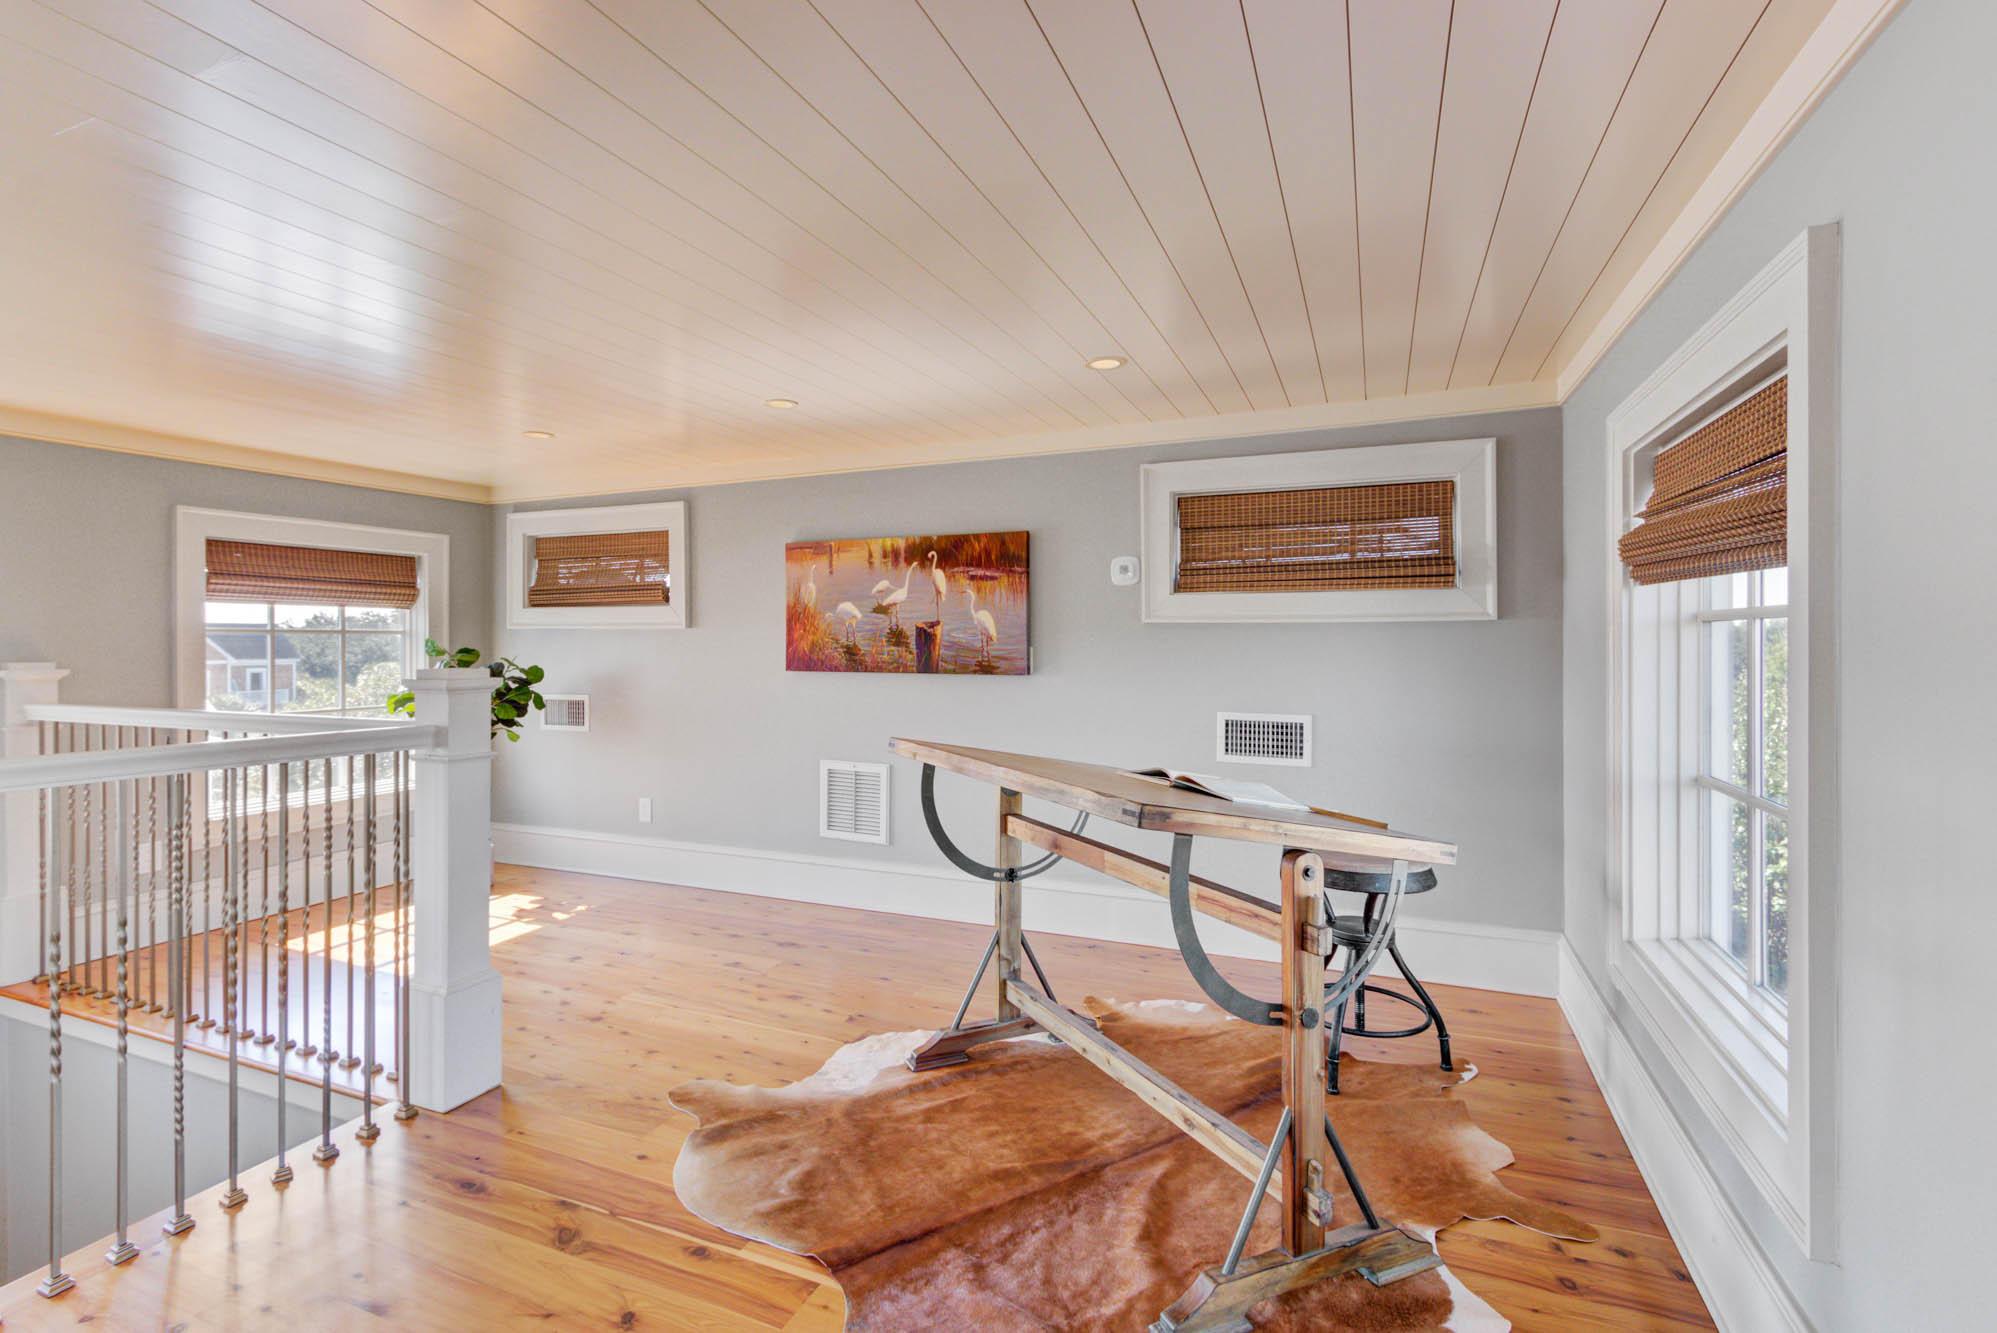 Sullivans Island Homes For Sale - 904 Middle, Sullivans Island, SC - 21